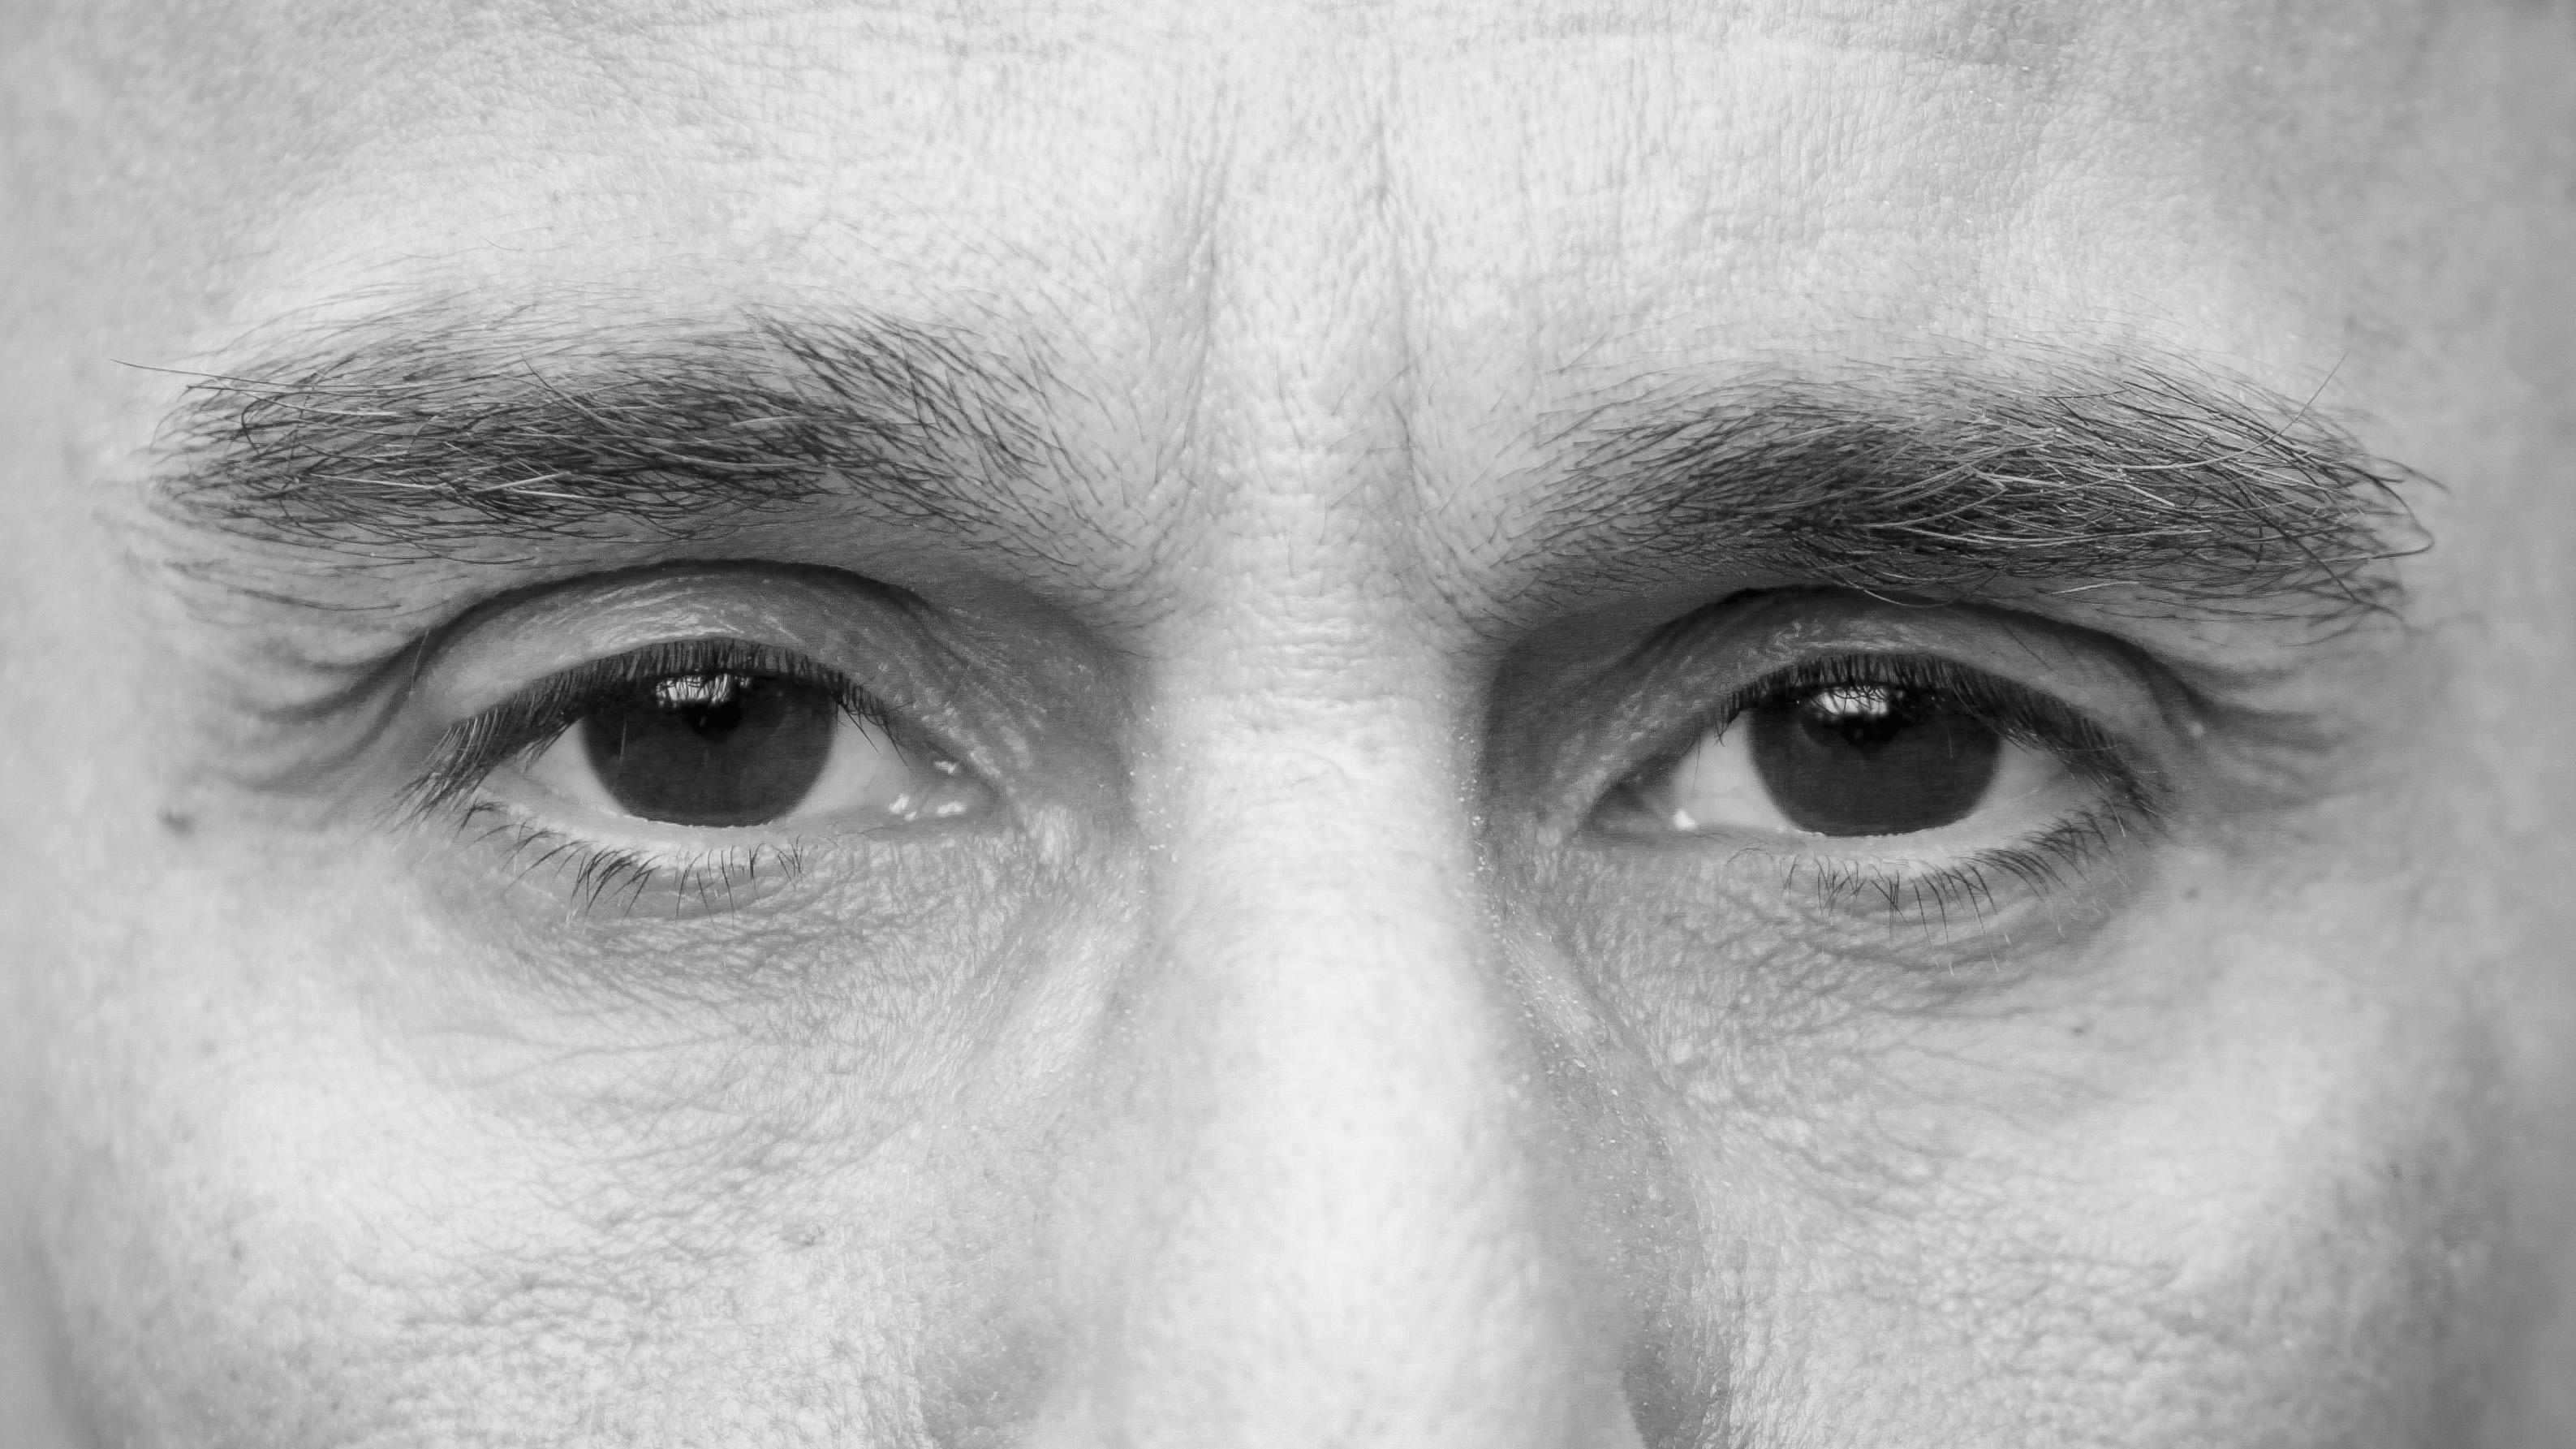 PeK_4313_Marco-Santi-Augen